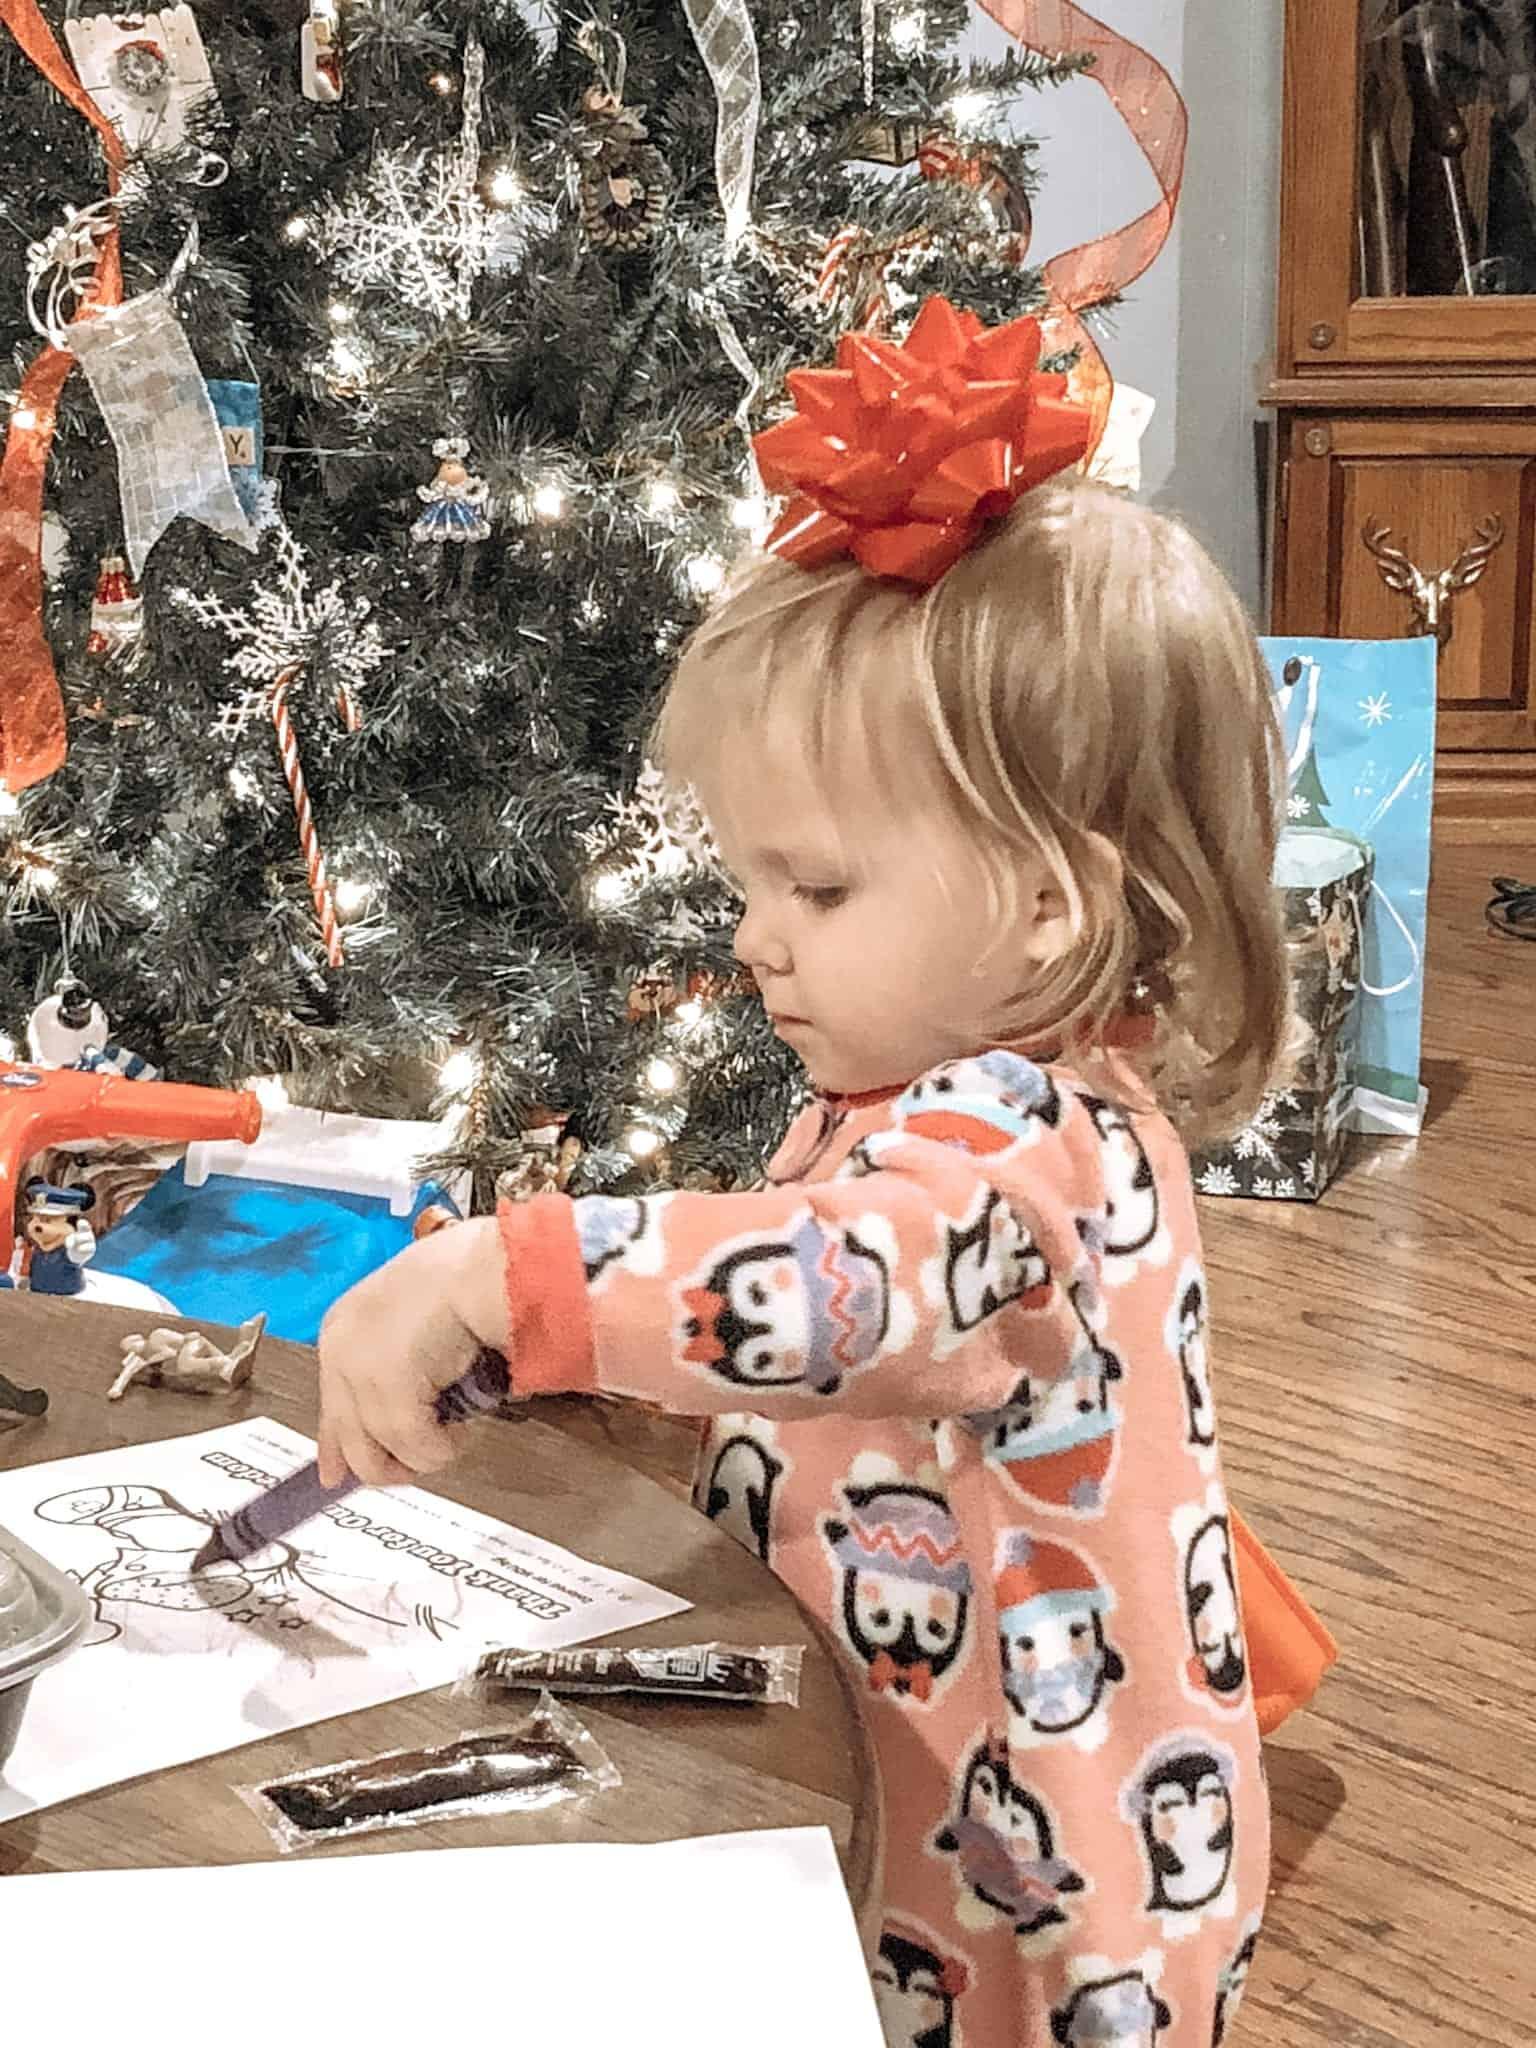 toddler at Christmas coloring